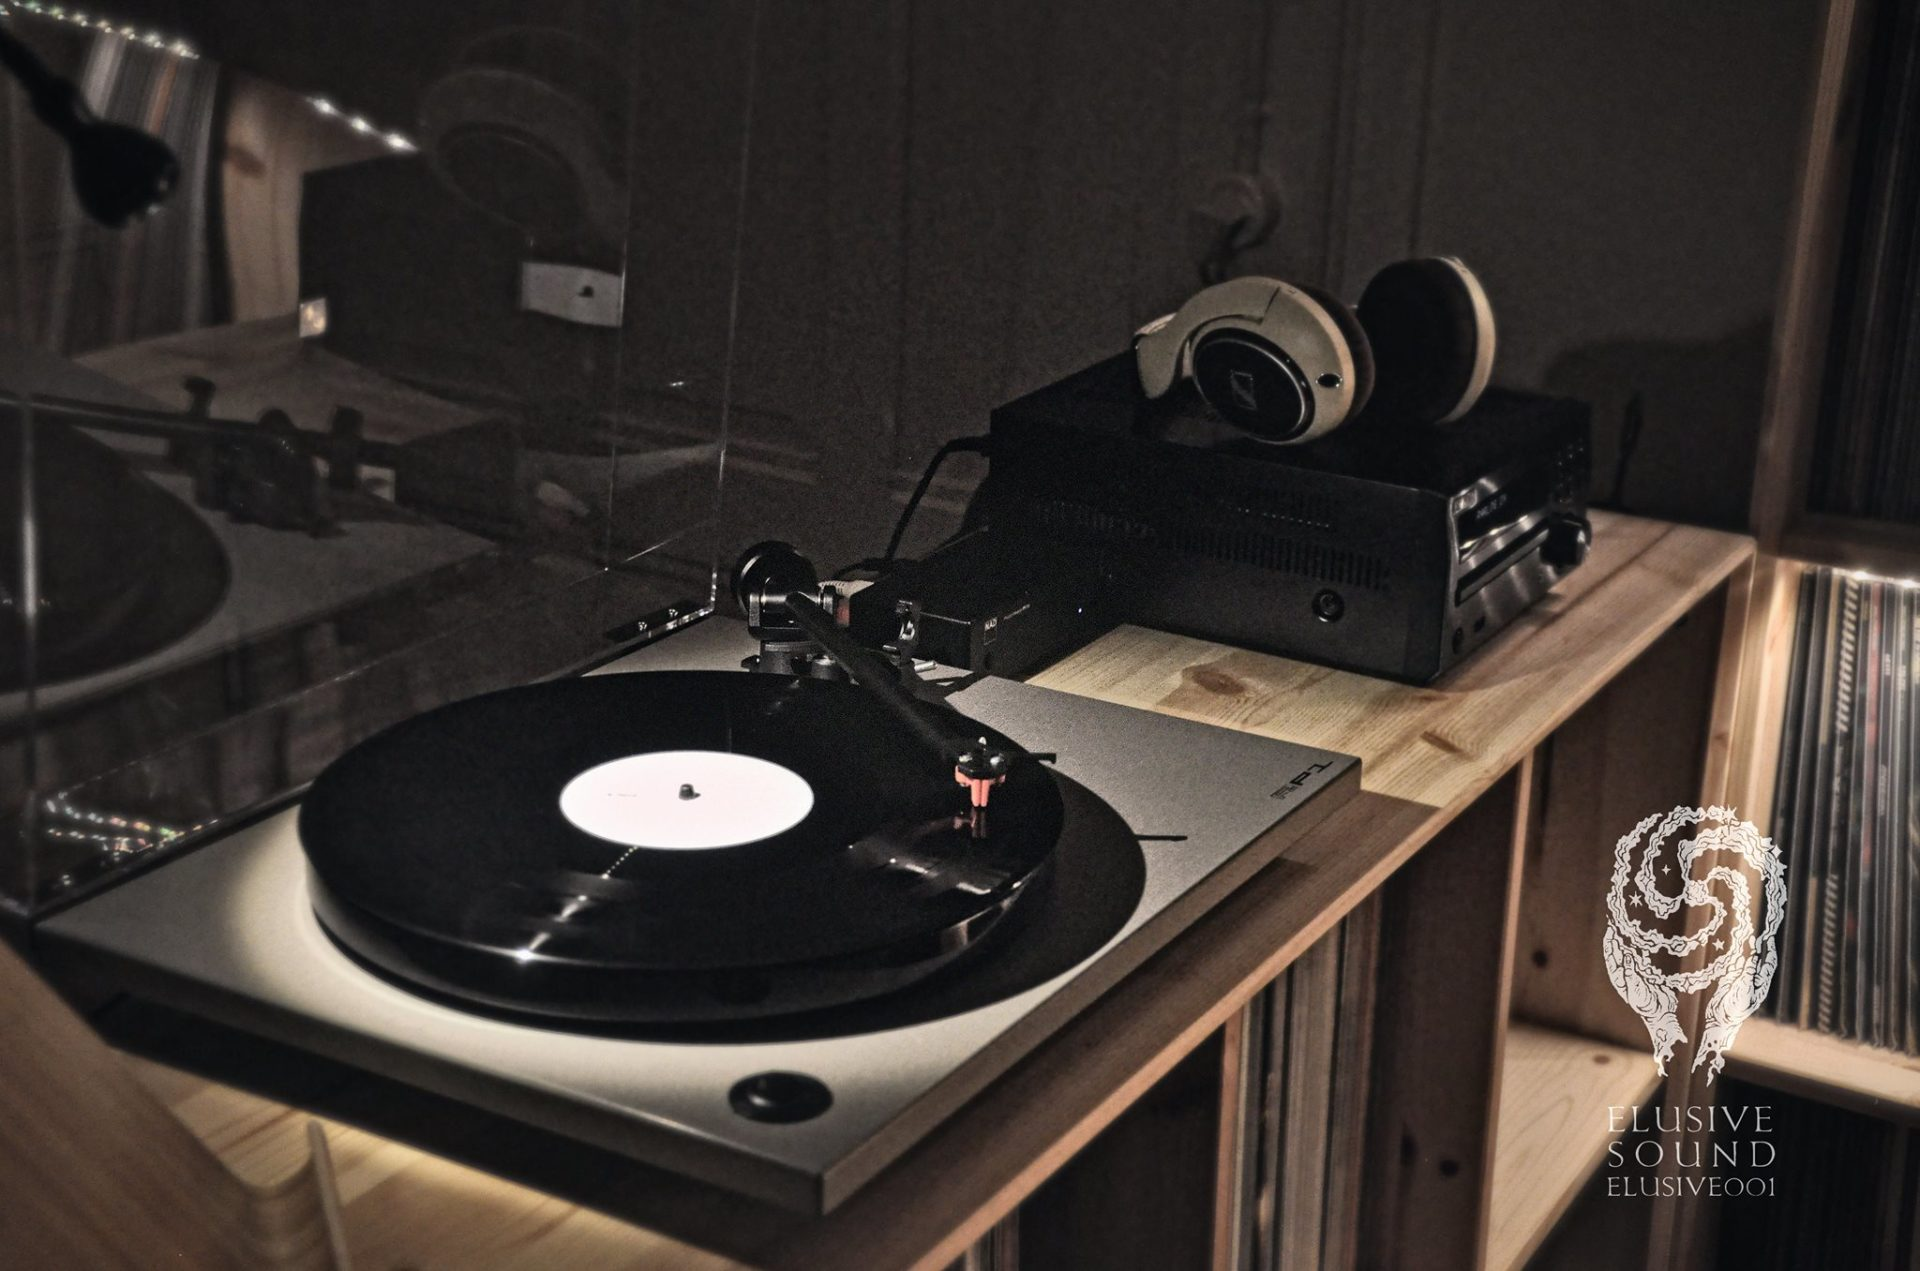 Elusive Sound - Record Label